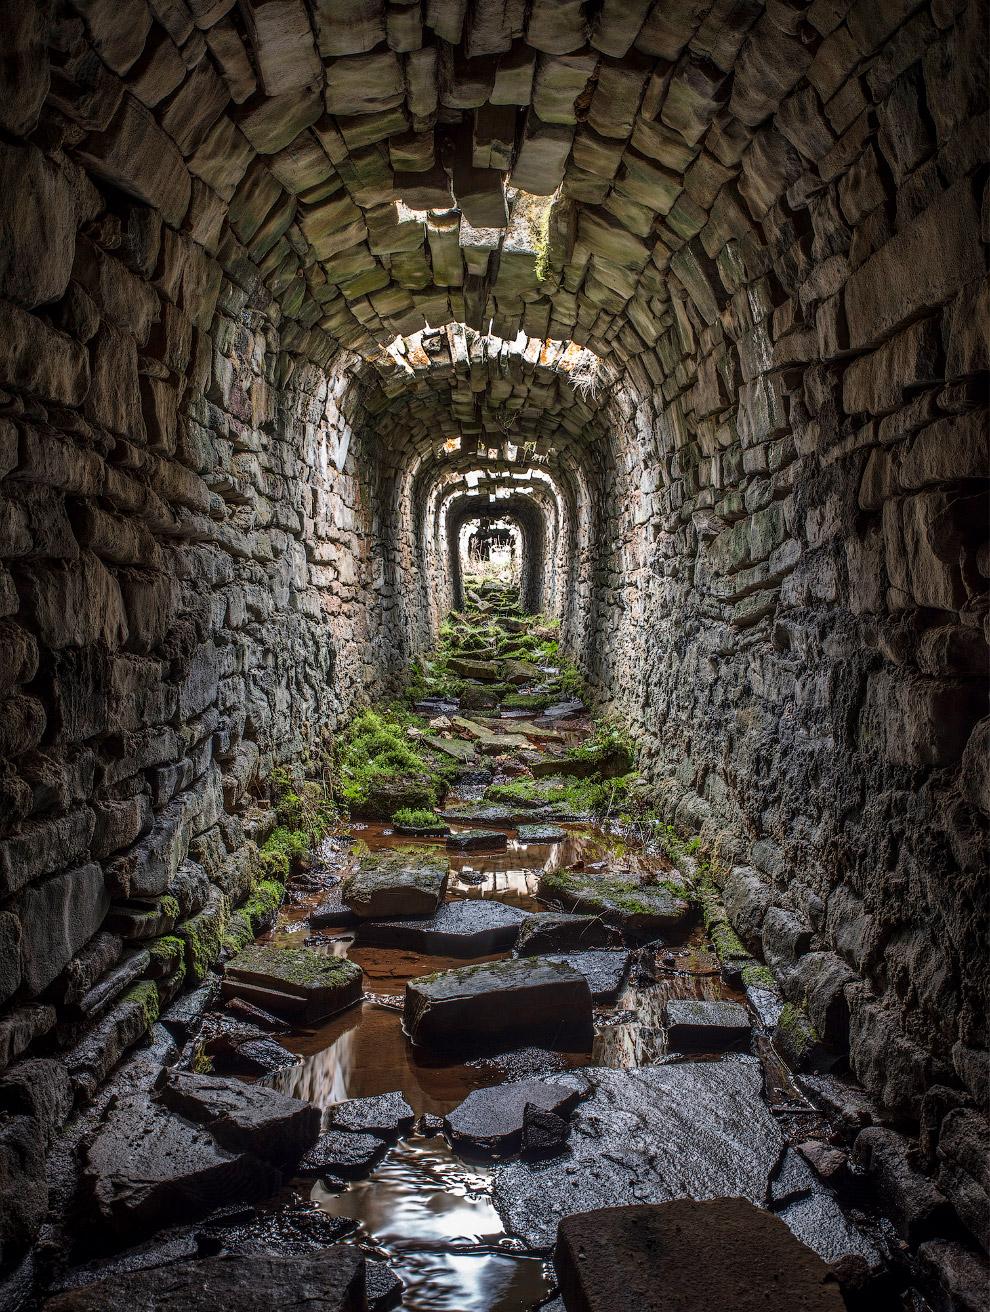 Рудники Ярнбери в Грассингтоне, графство Йоркшир